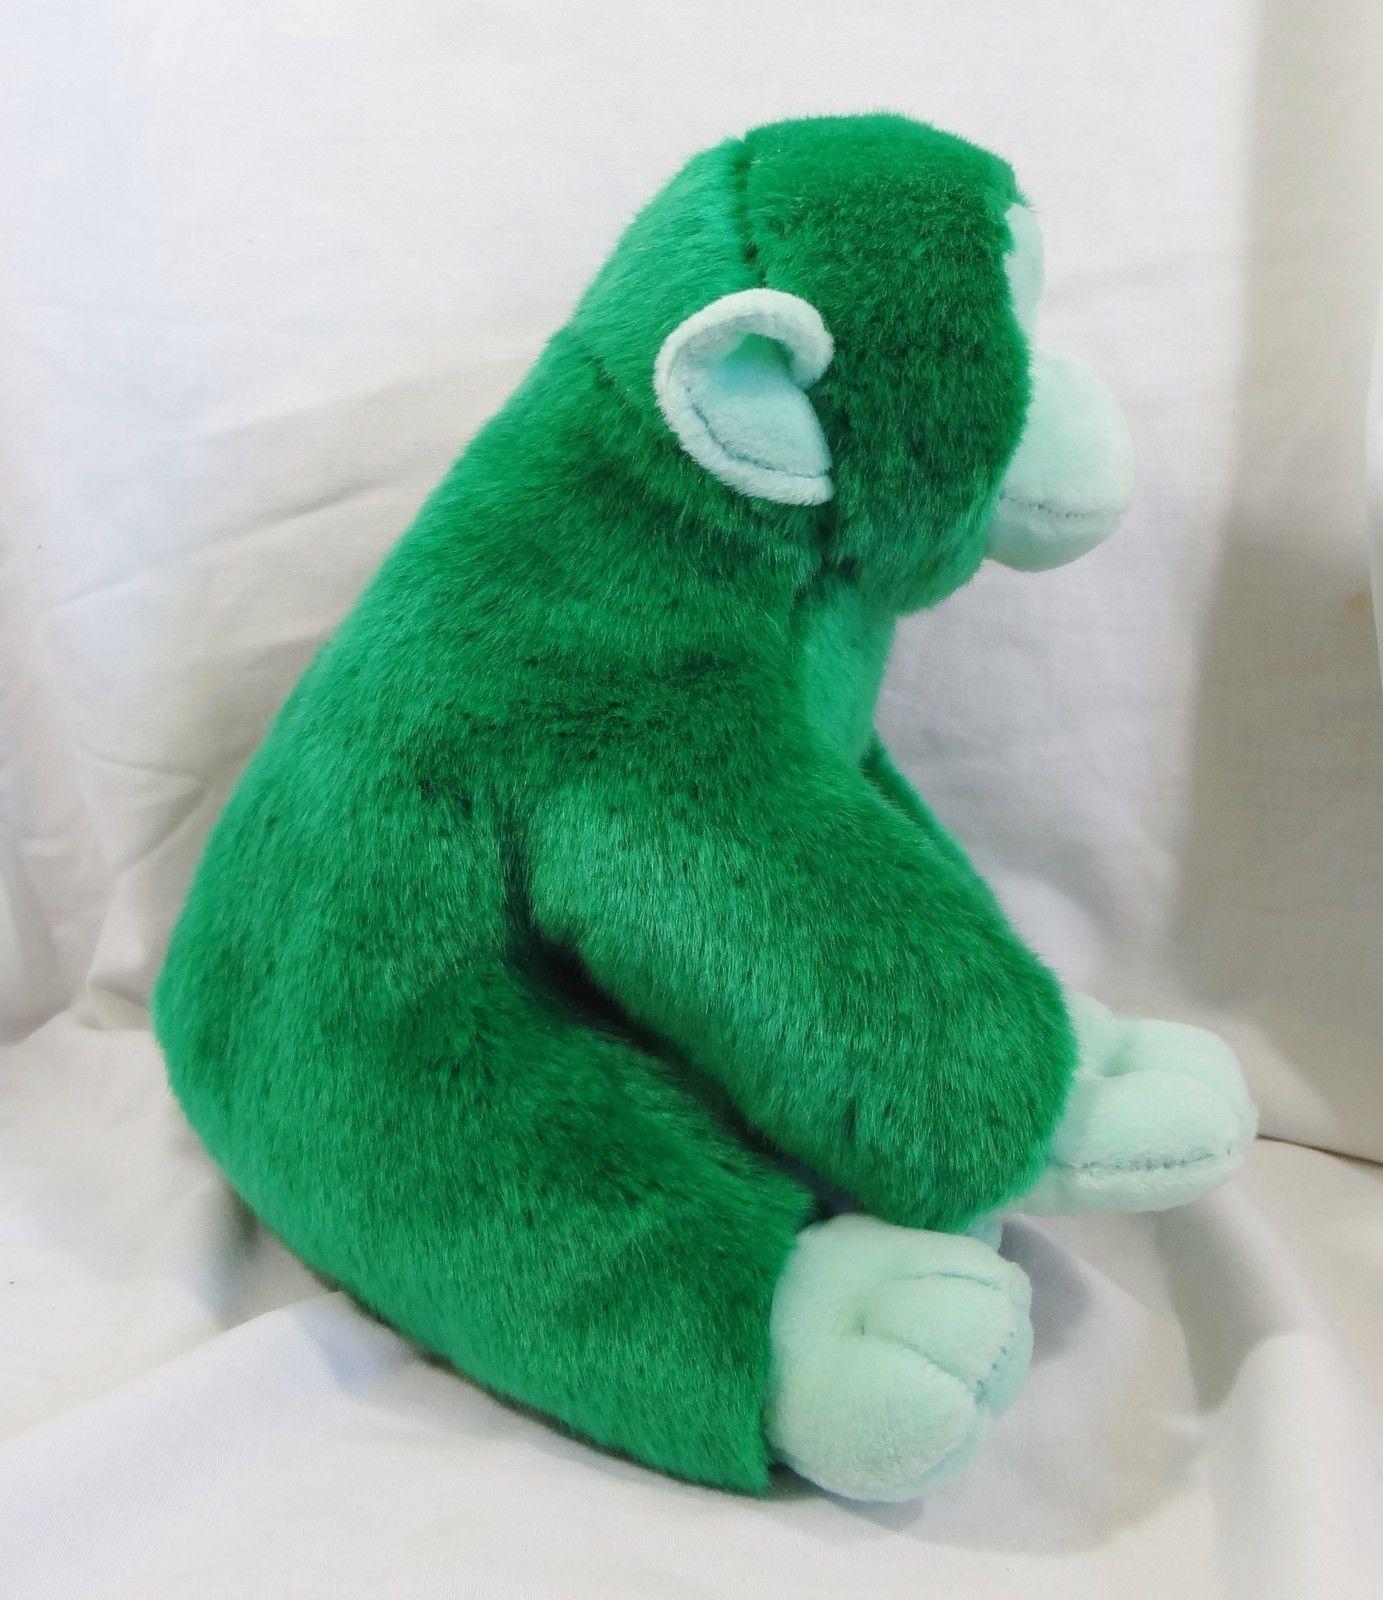 Cuddlekins Vibes Shelby The Chimp Green Plush Stuffed Animal Toy New Very Soft